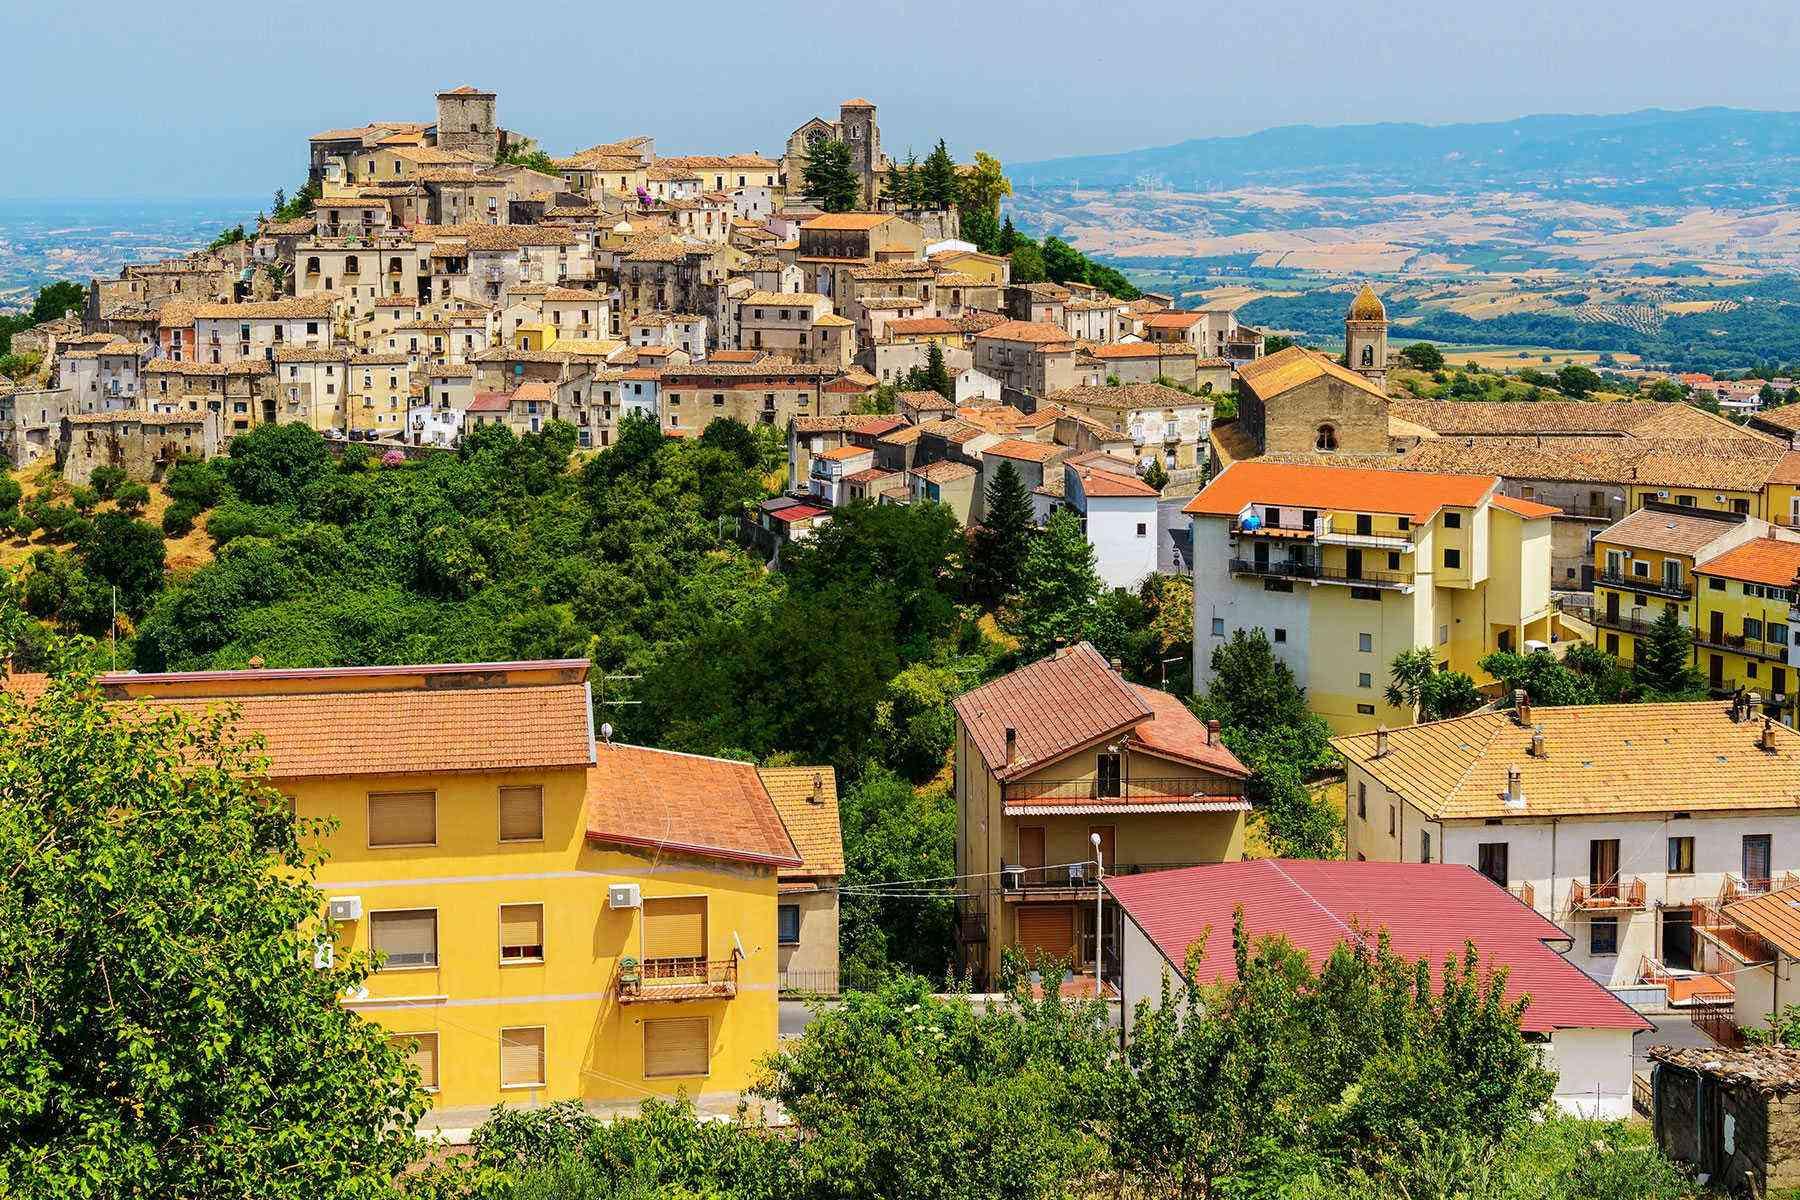 Medieval-Italian-Towns-Altomonte-1